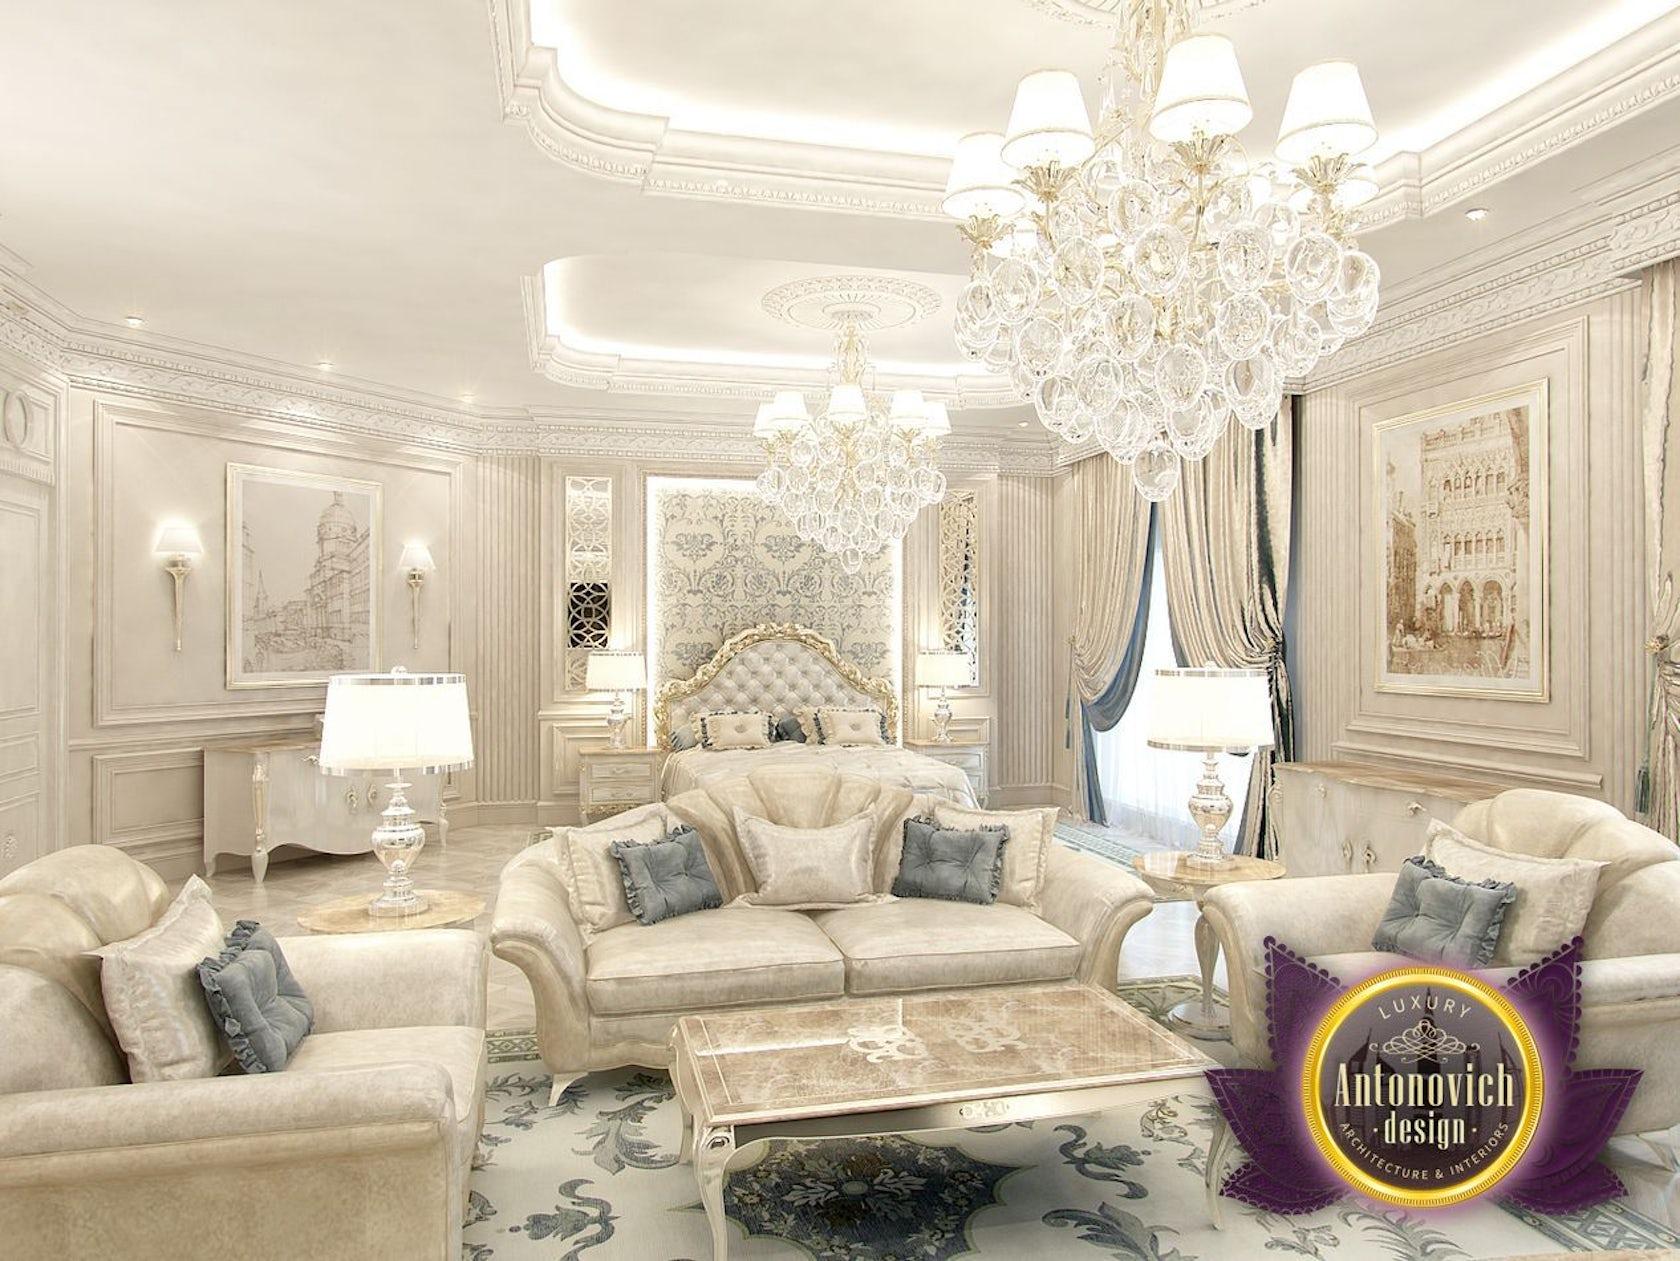 Master bedroom design from luxury antonovich design on architizer